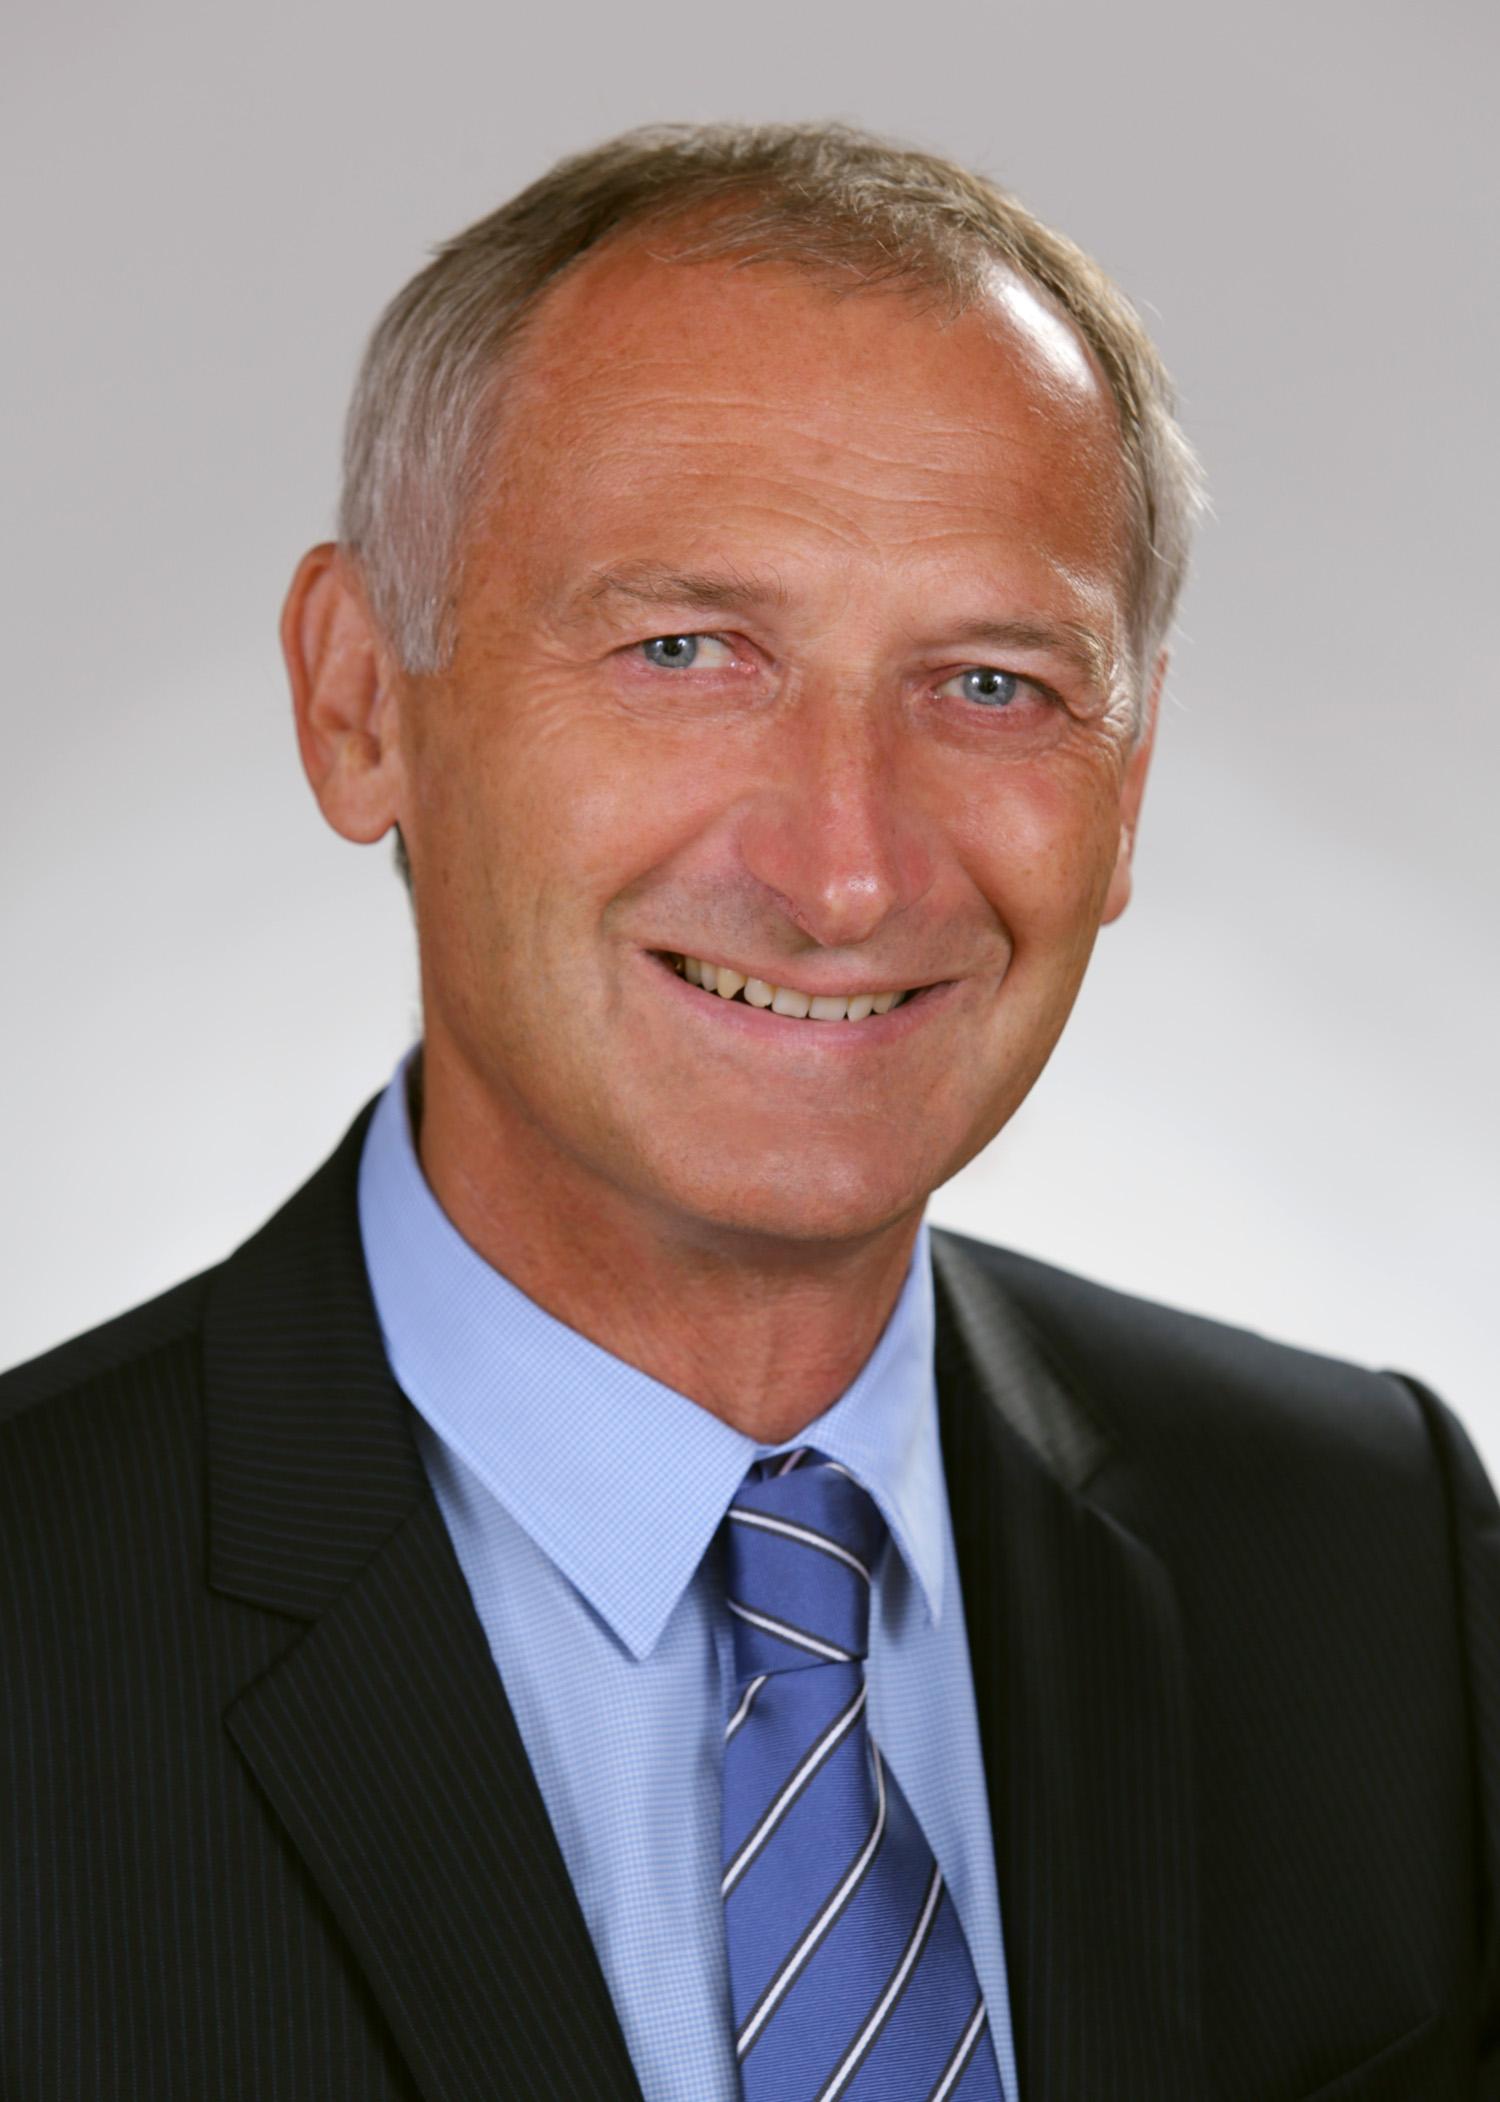 Andreas Kropik